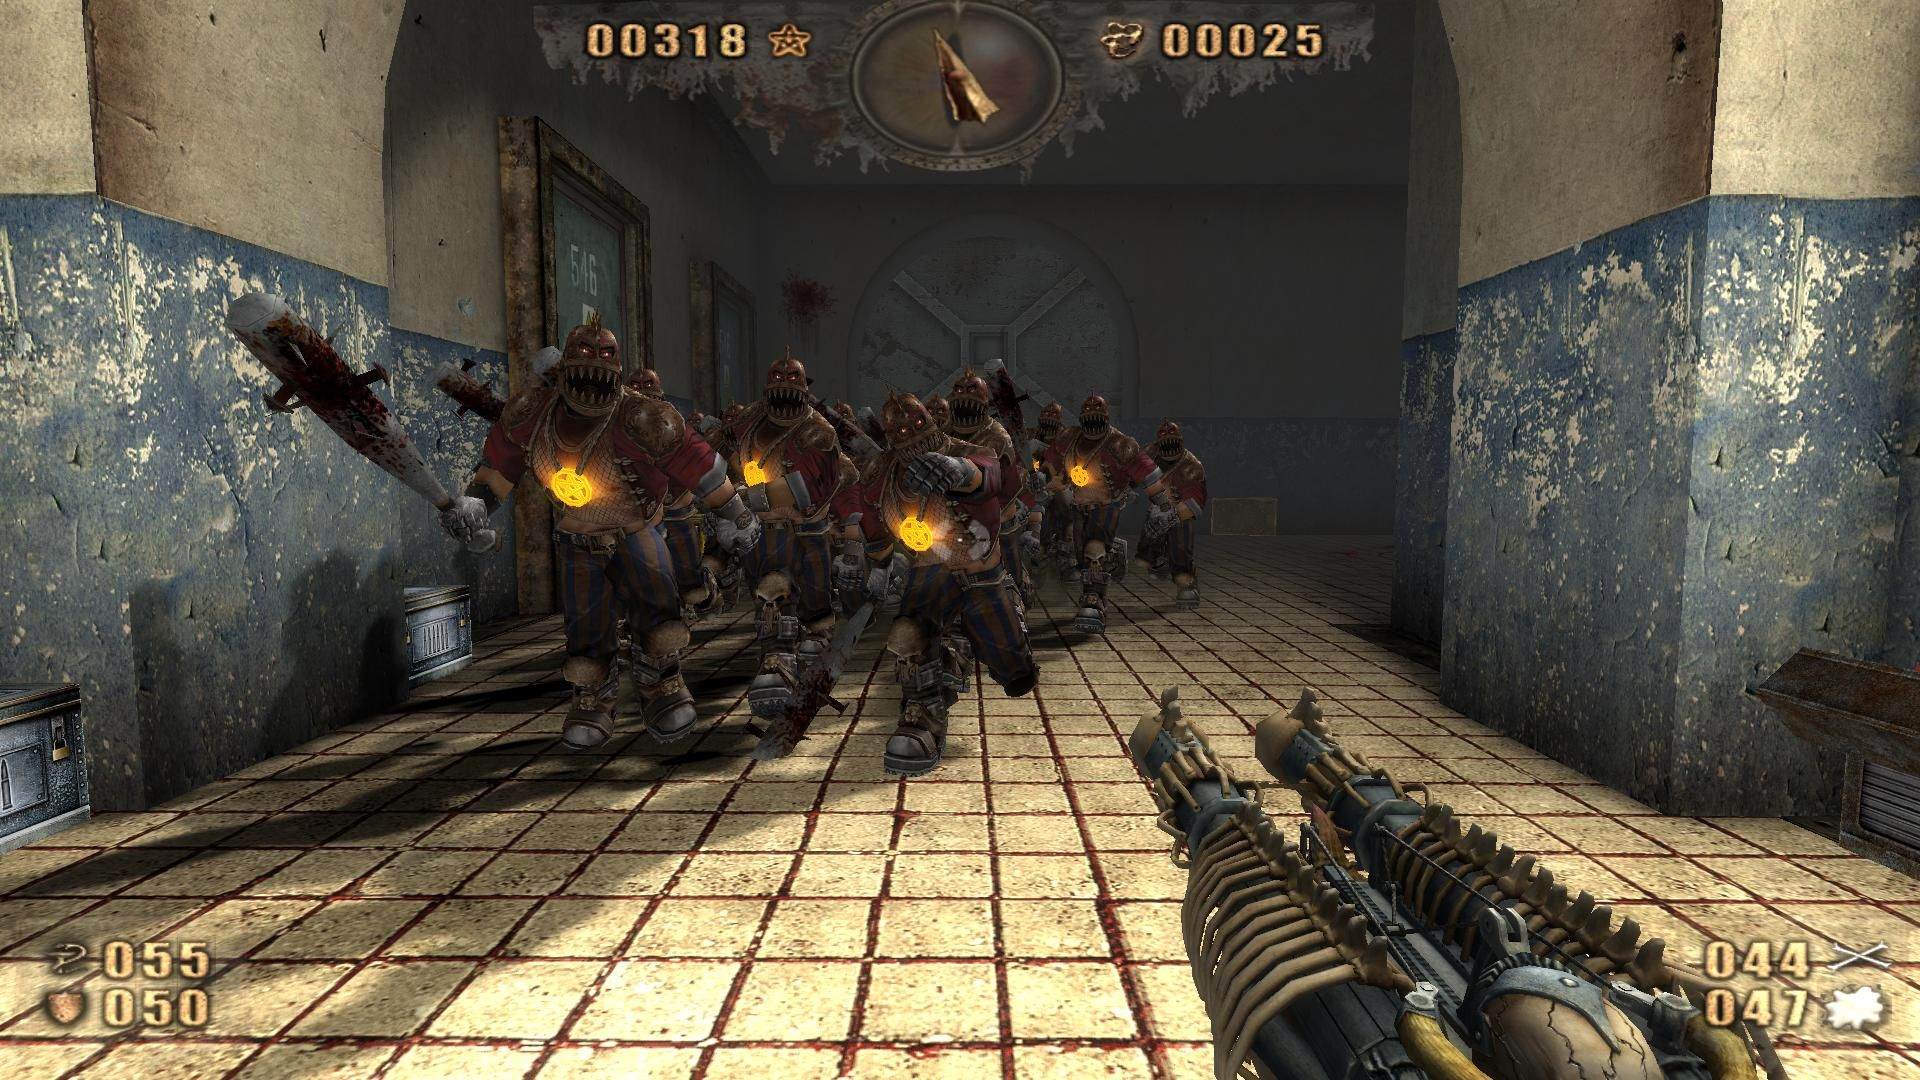 Download Painkiller Overdose - Torrent Game for PC